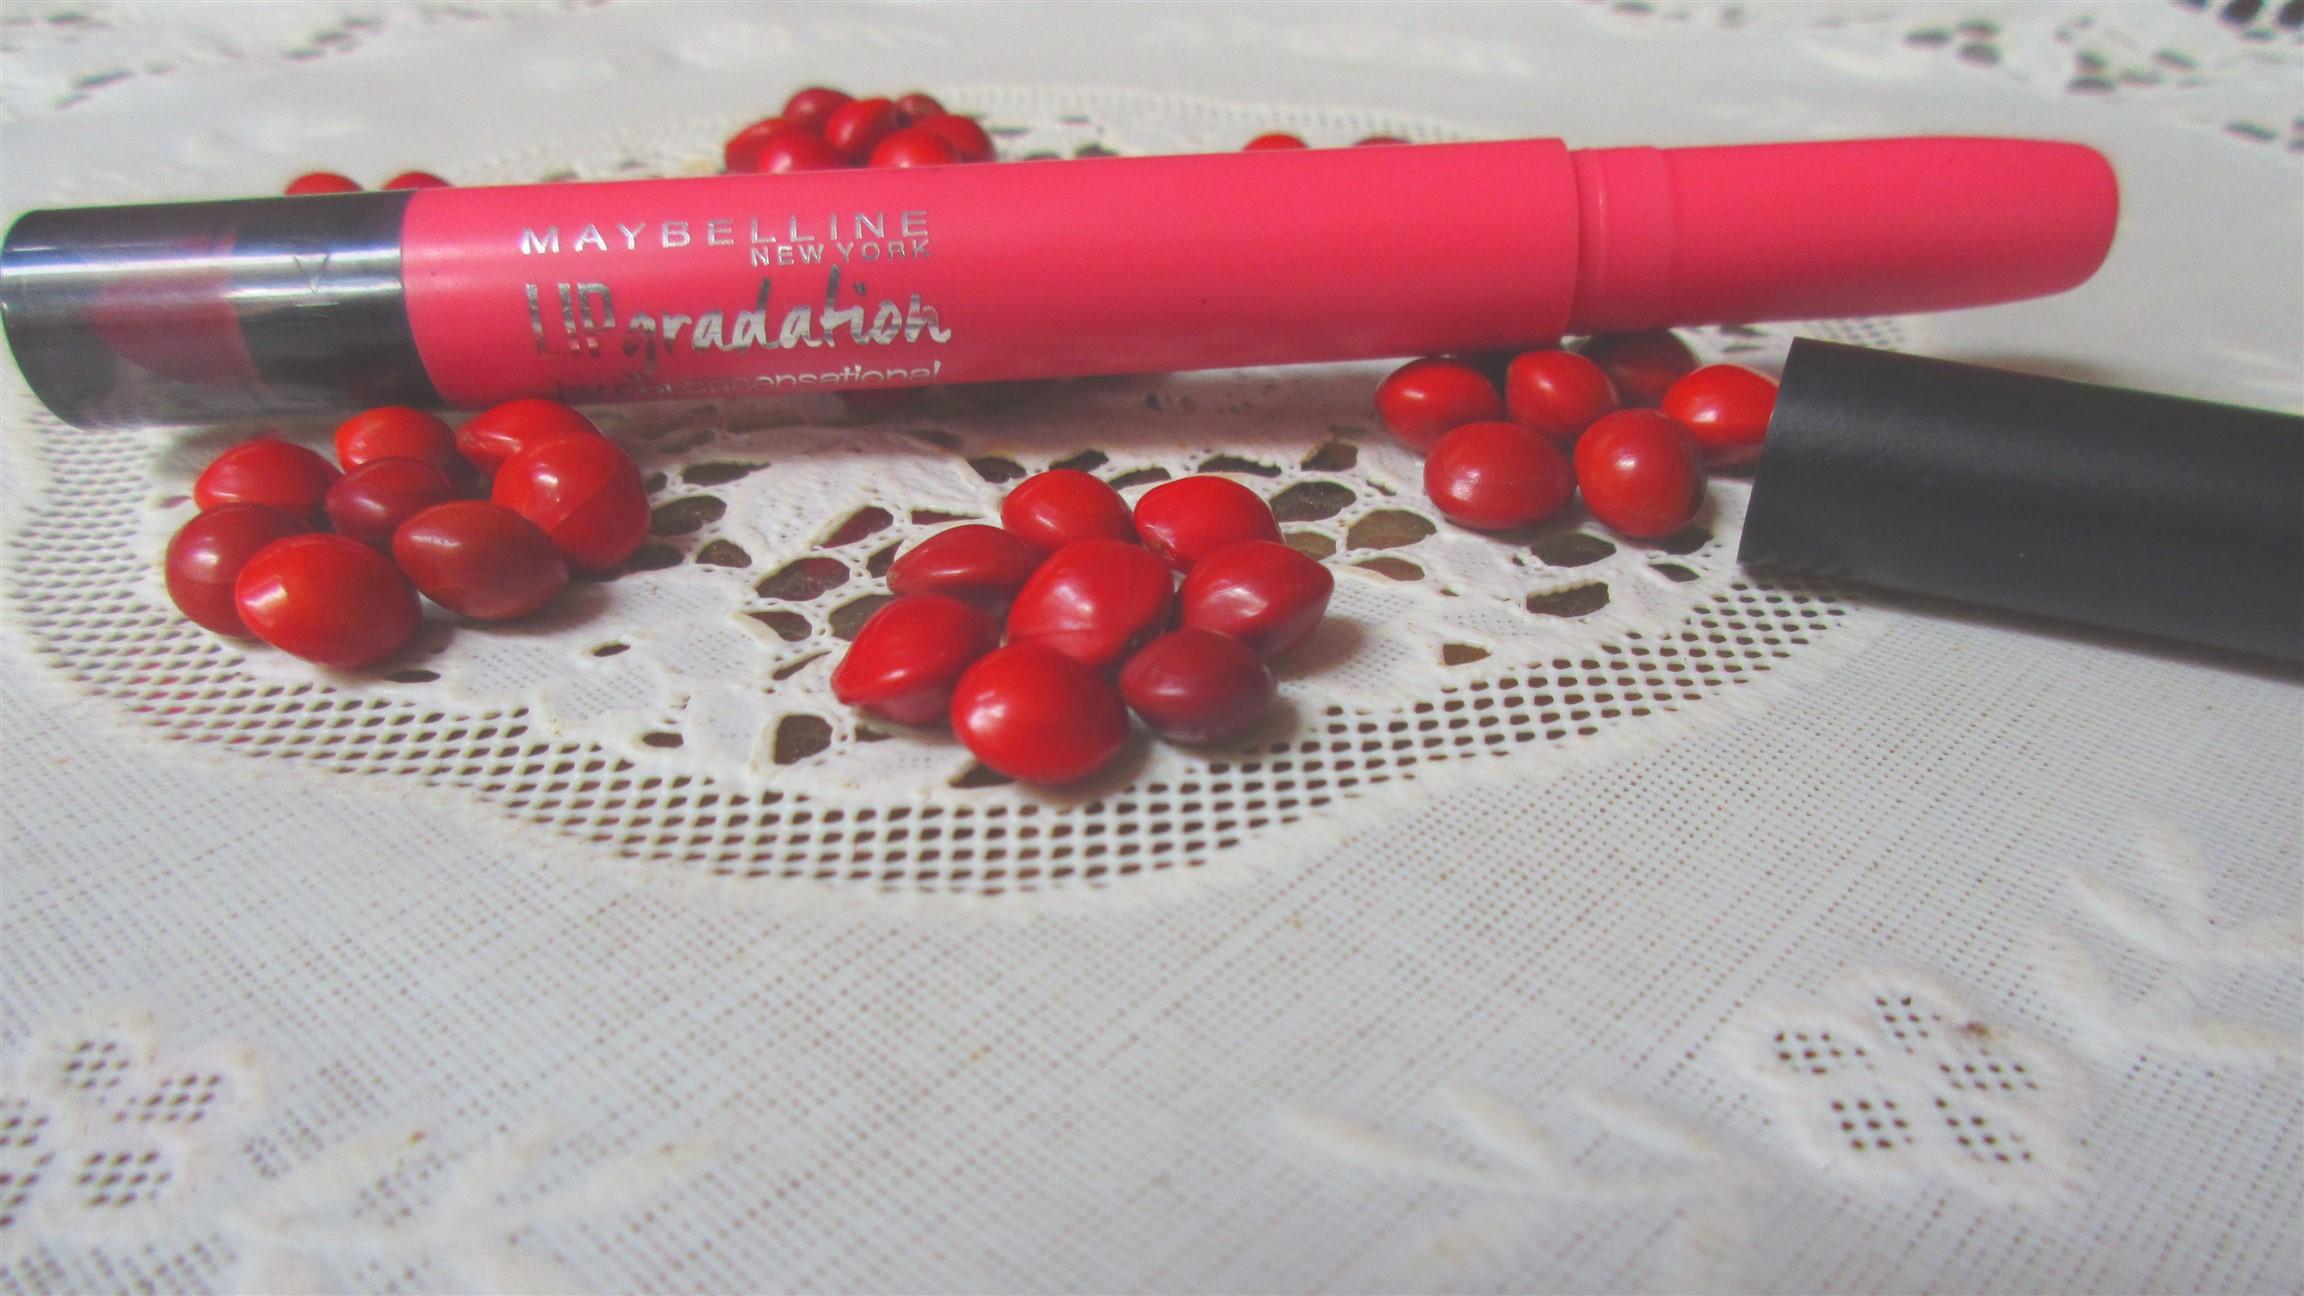 maybelline lip gradation range the jeromy diaris